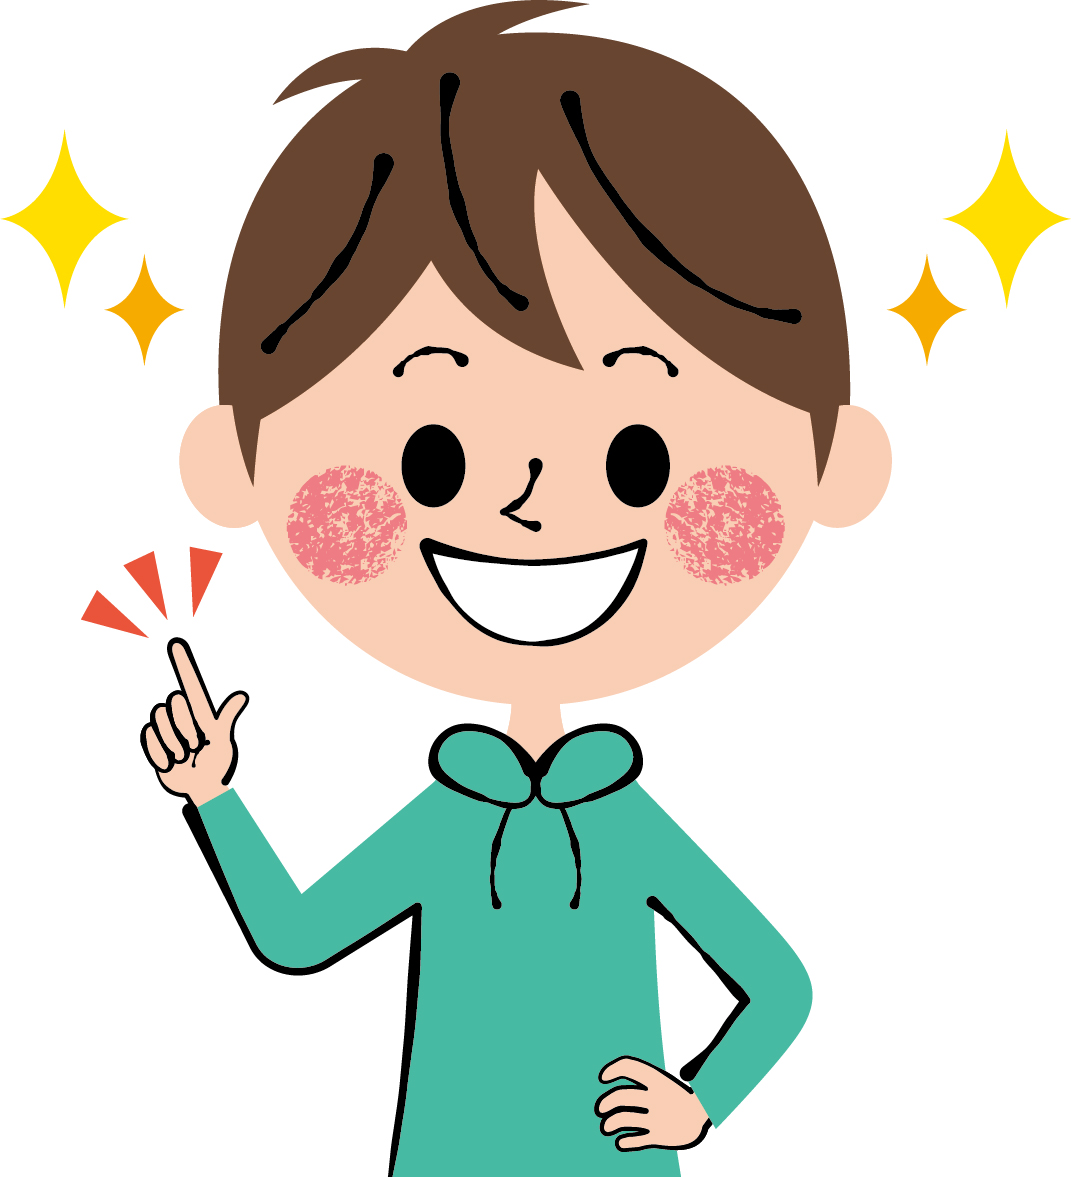 Hiro_icon